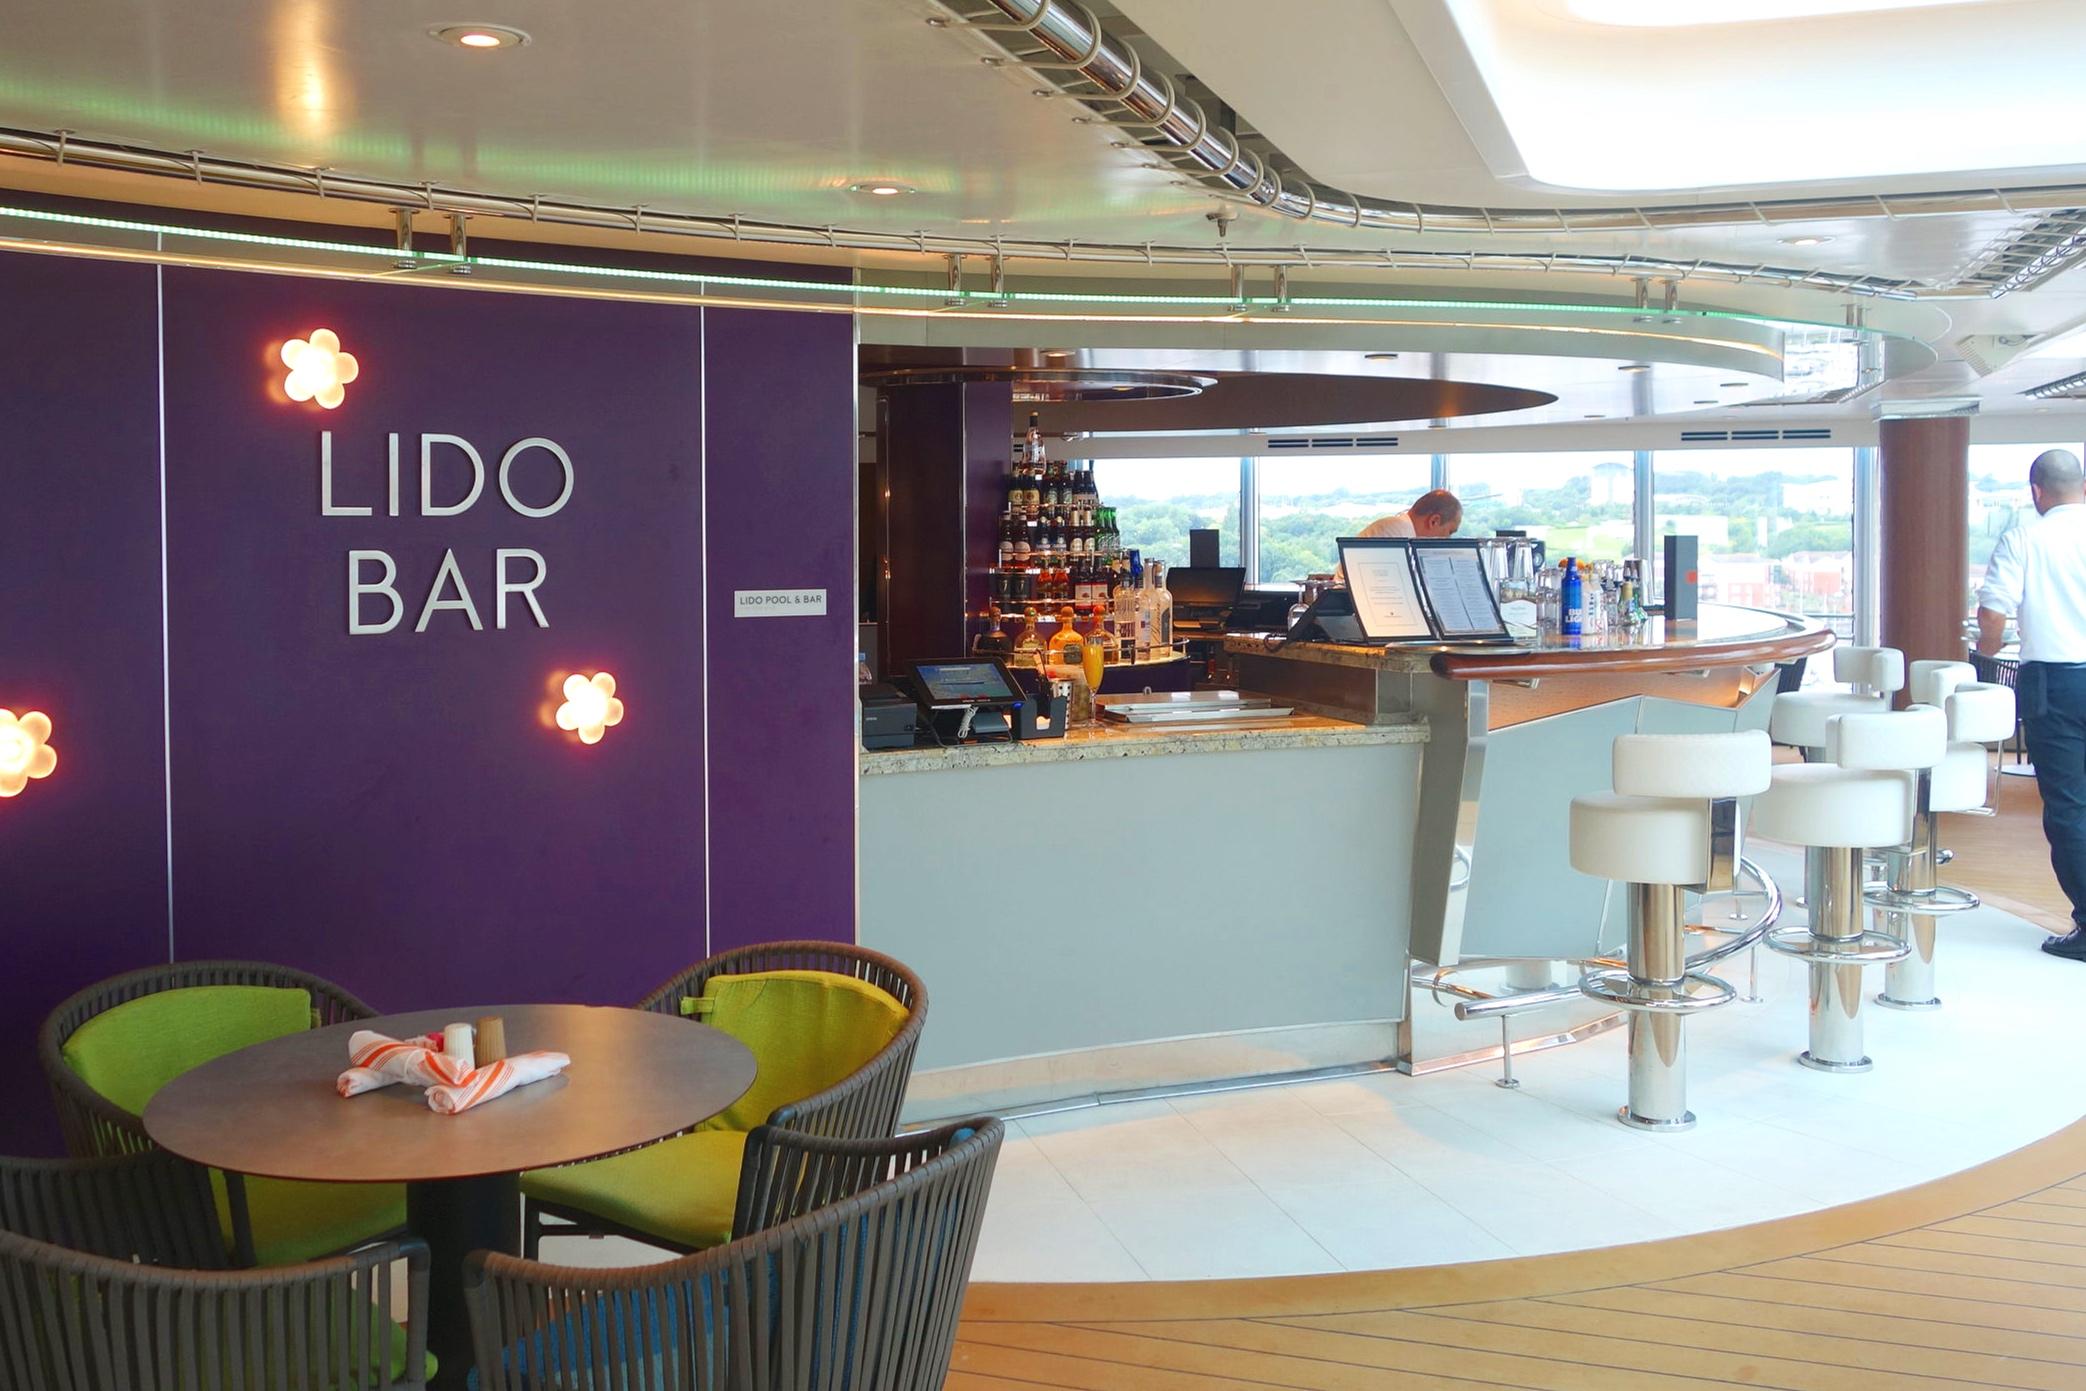 The Lido bar